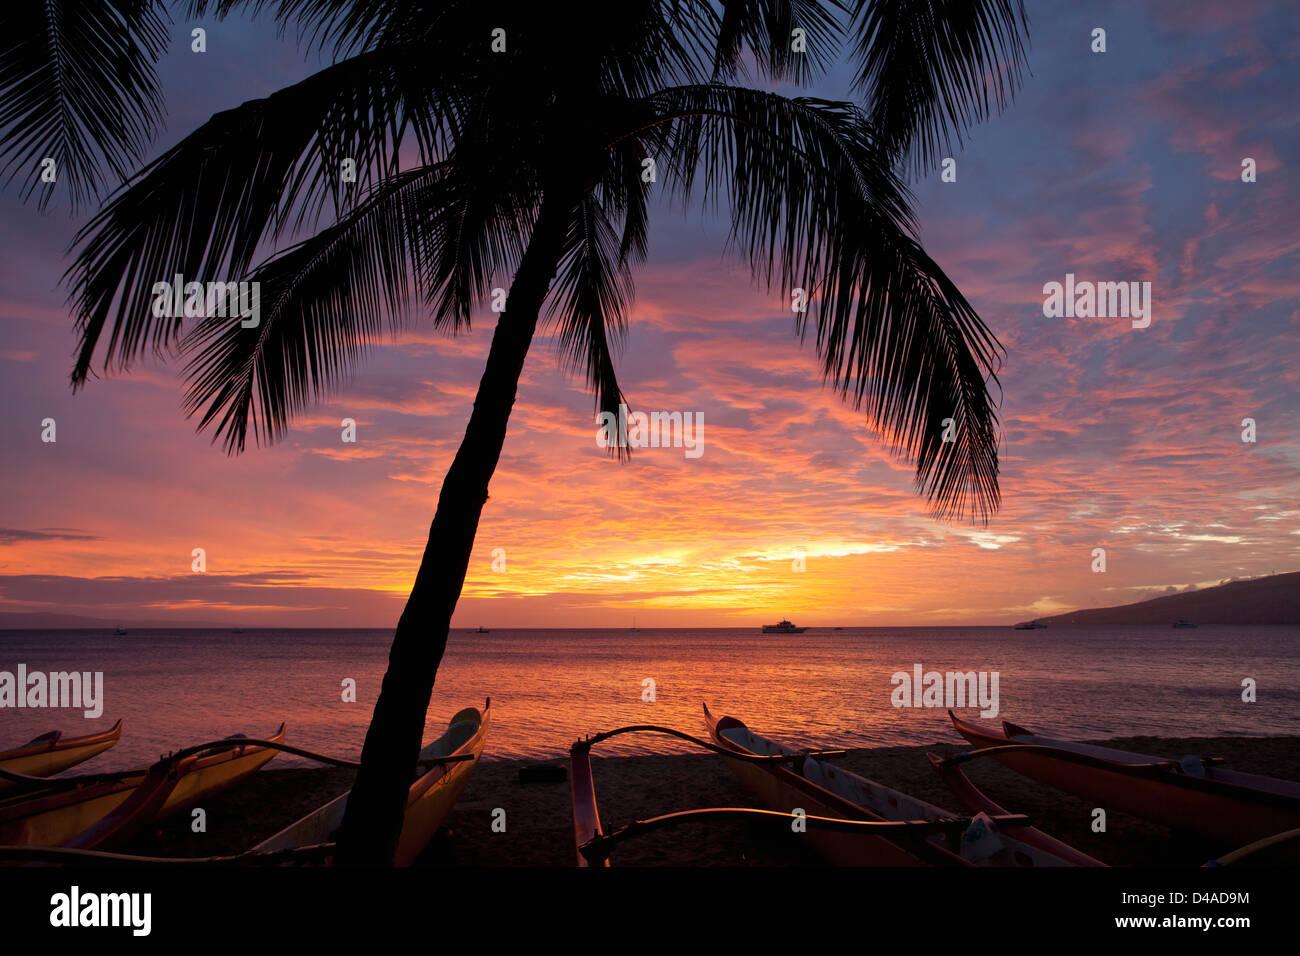 Spectacular sunset at Kihei, Maui, Hawaii. - Stock Image